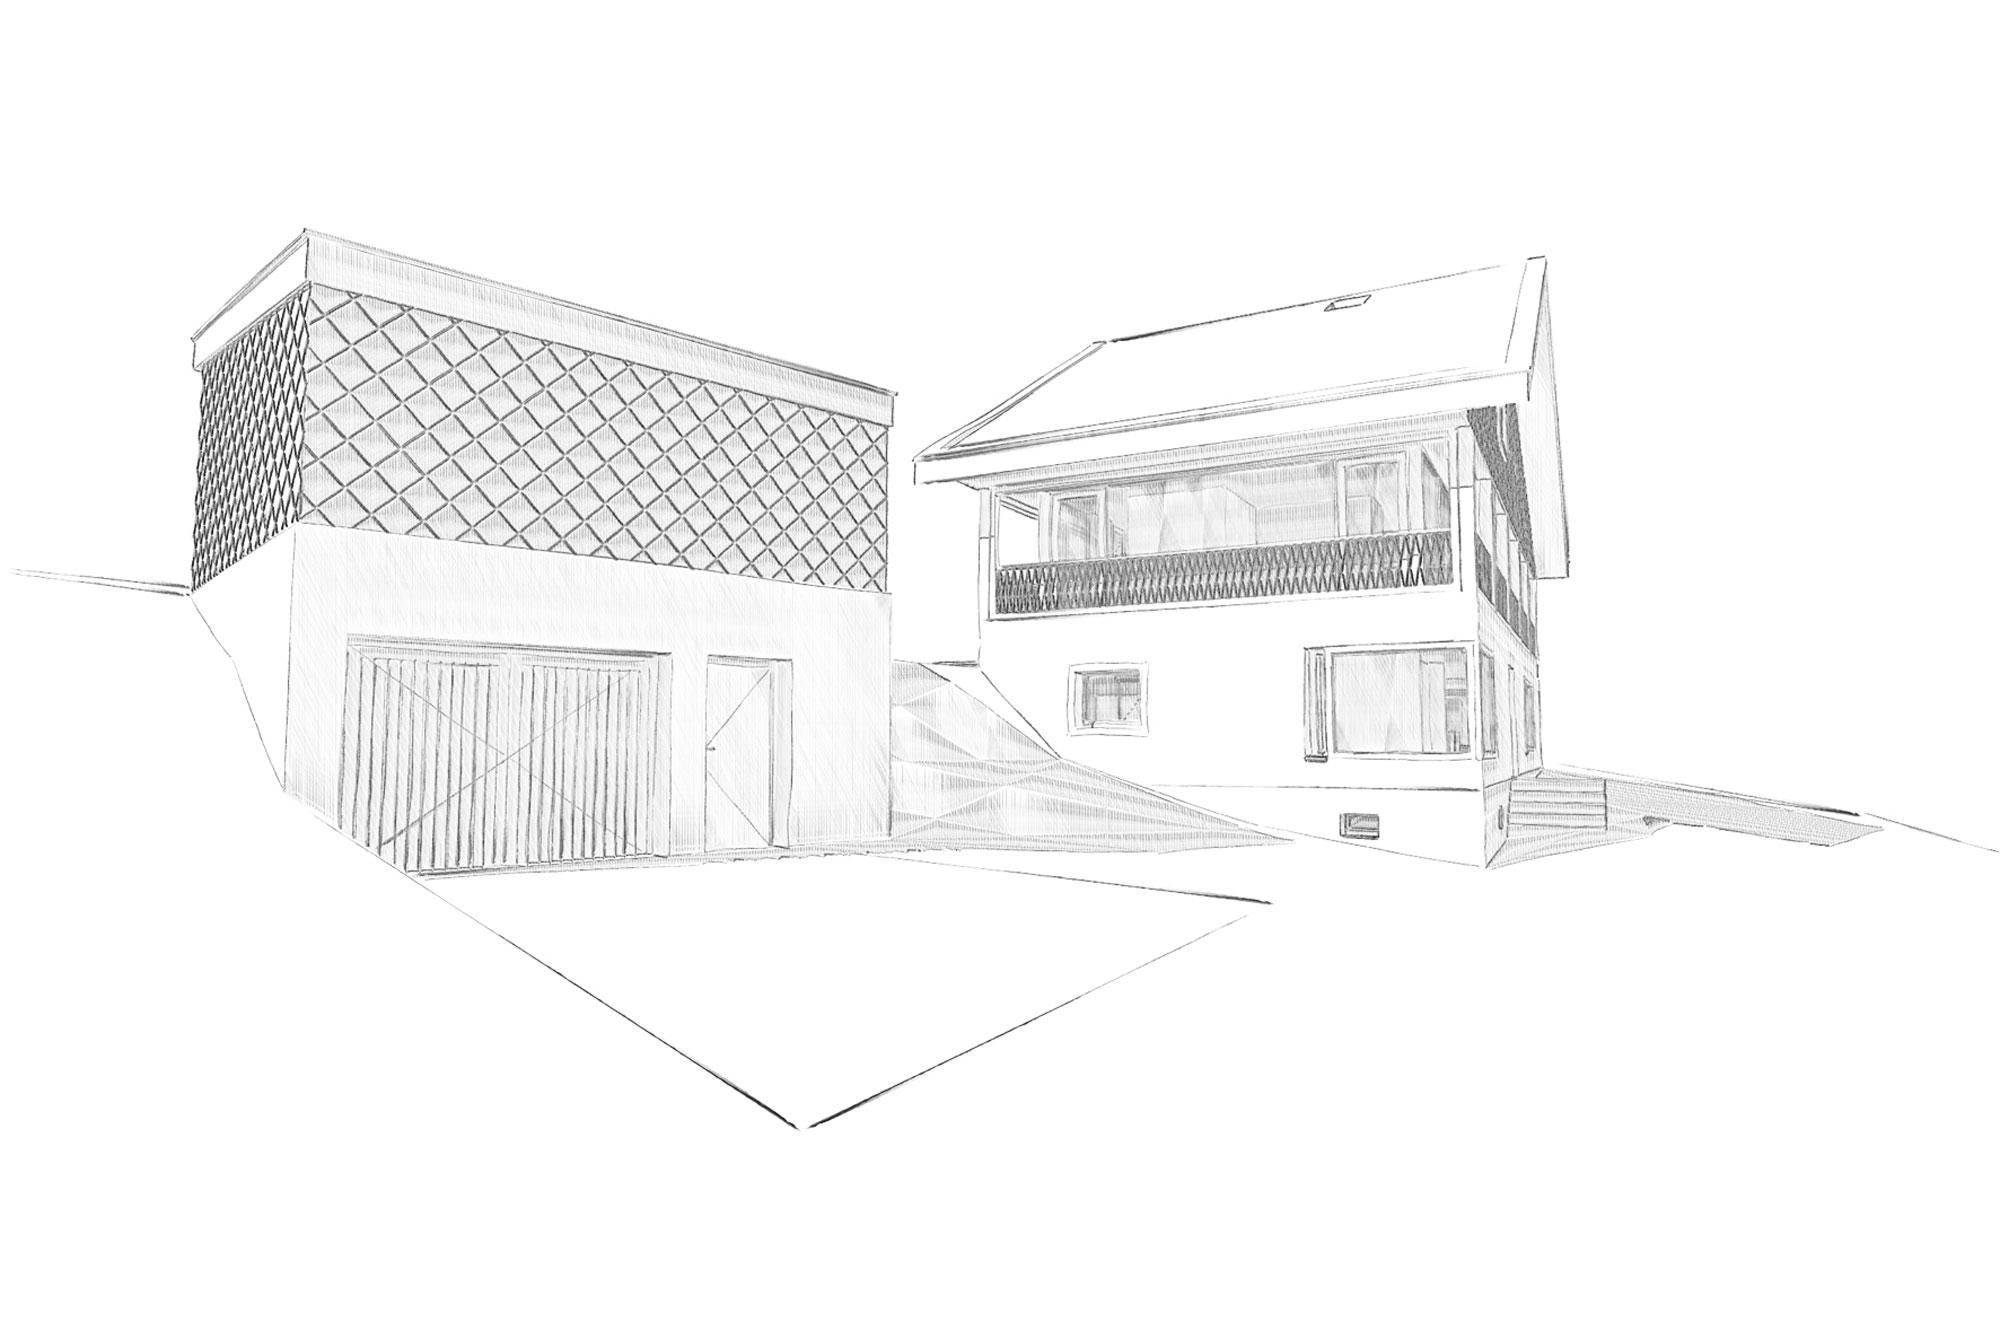 MAA_Murer_Andre_Architektur_Ersatzneubau_Buochs_003.jpg